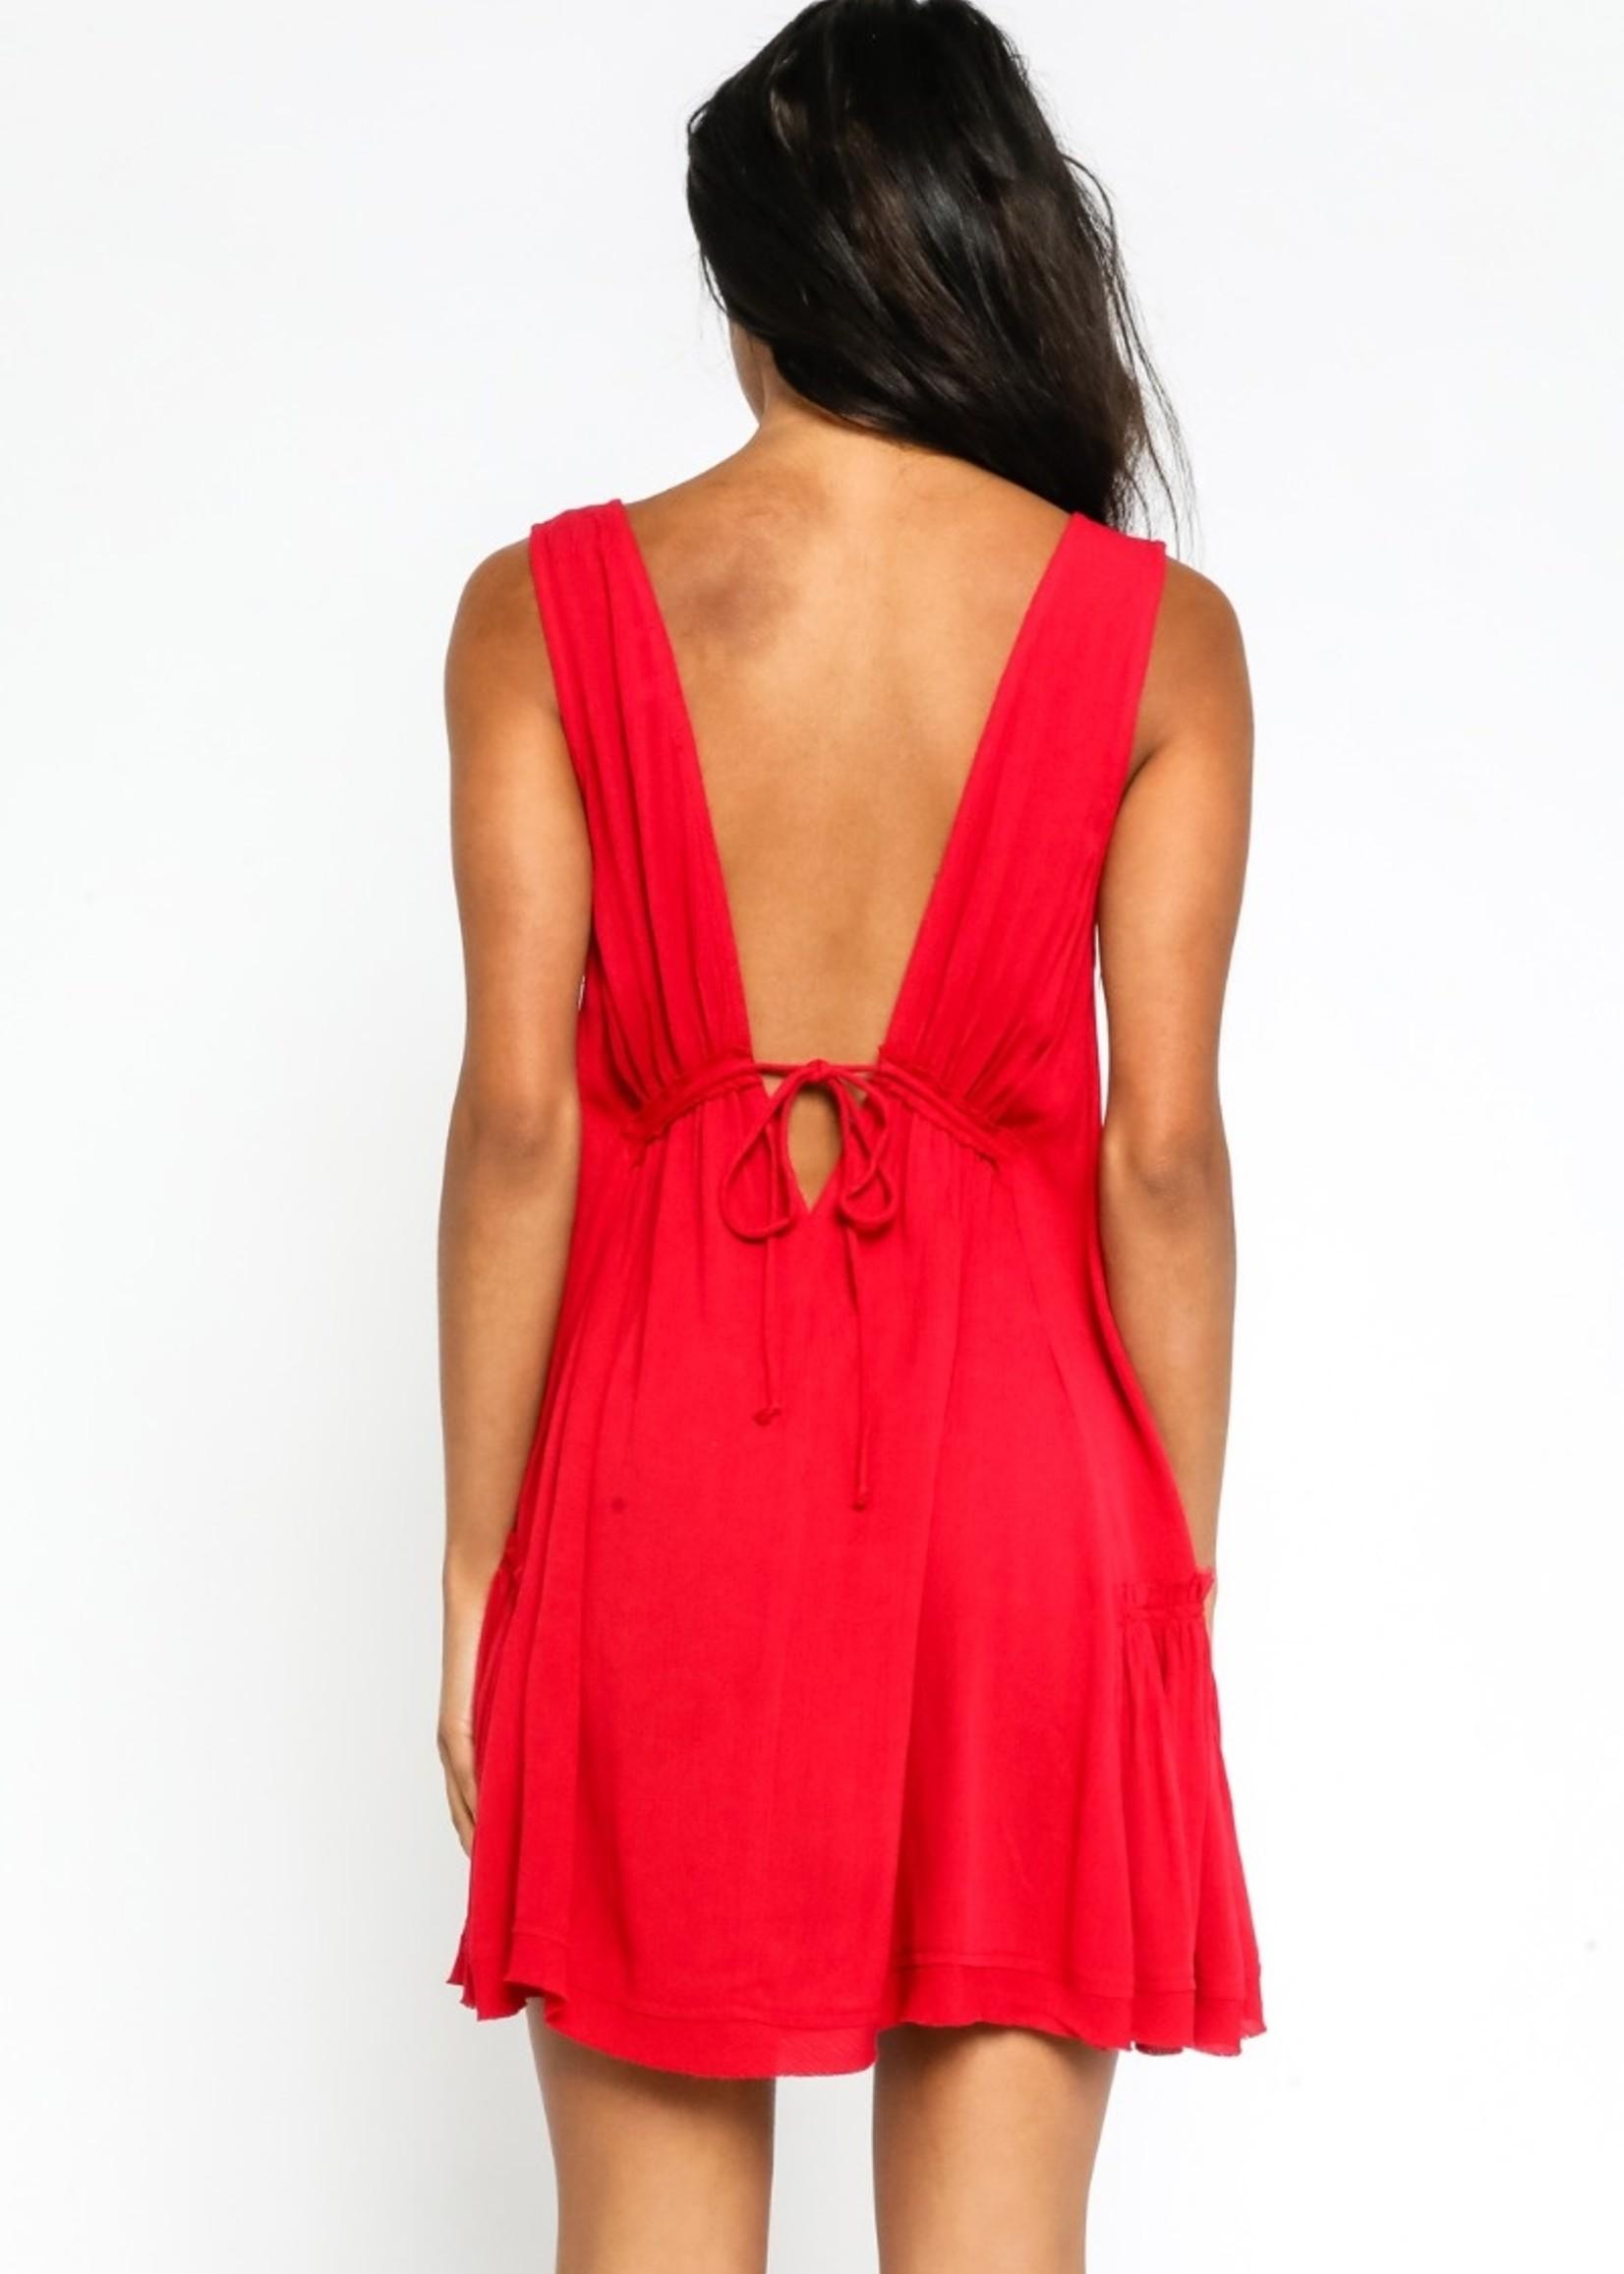 Tank Plunge Neck Dress-Bombshell Red